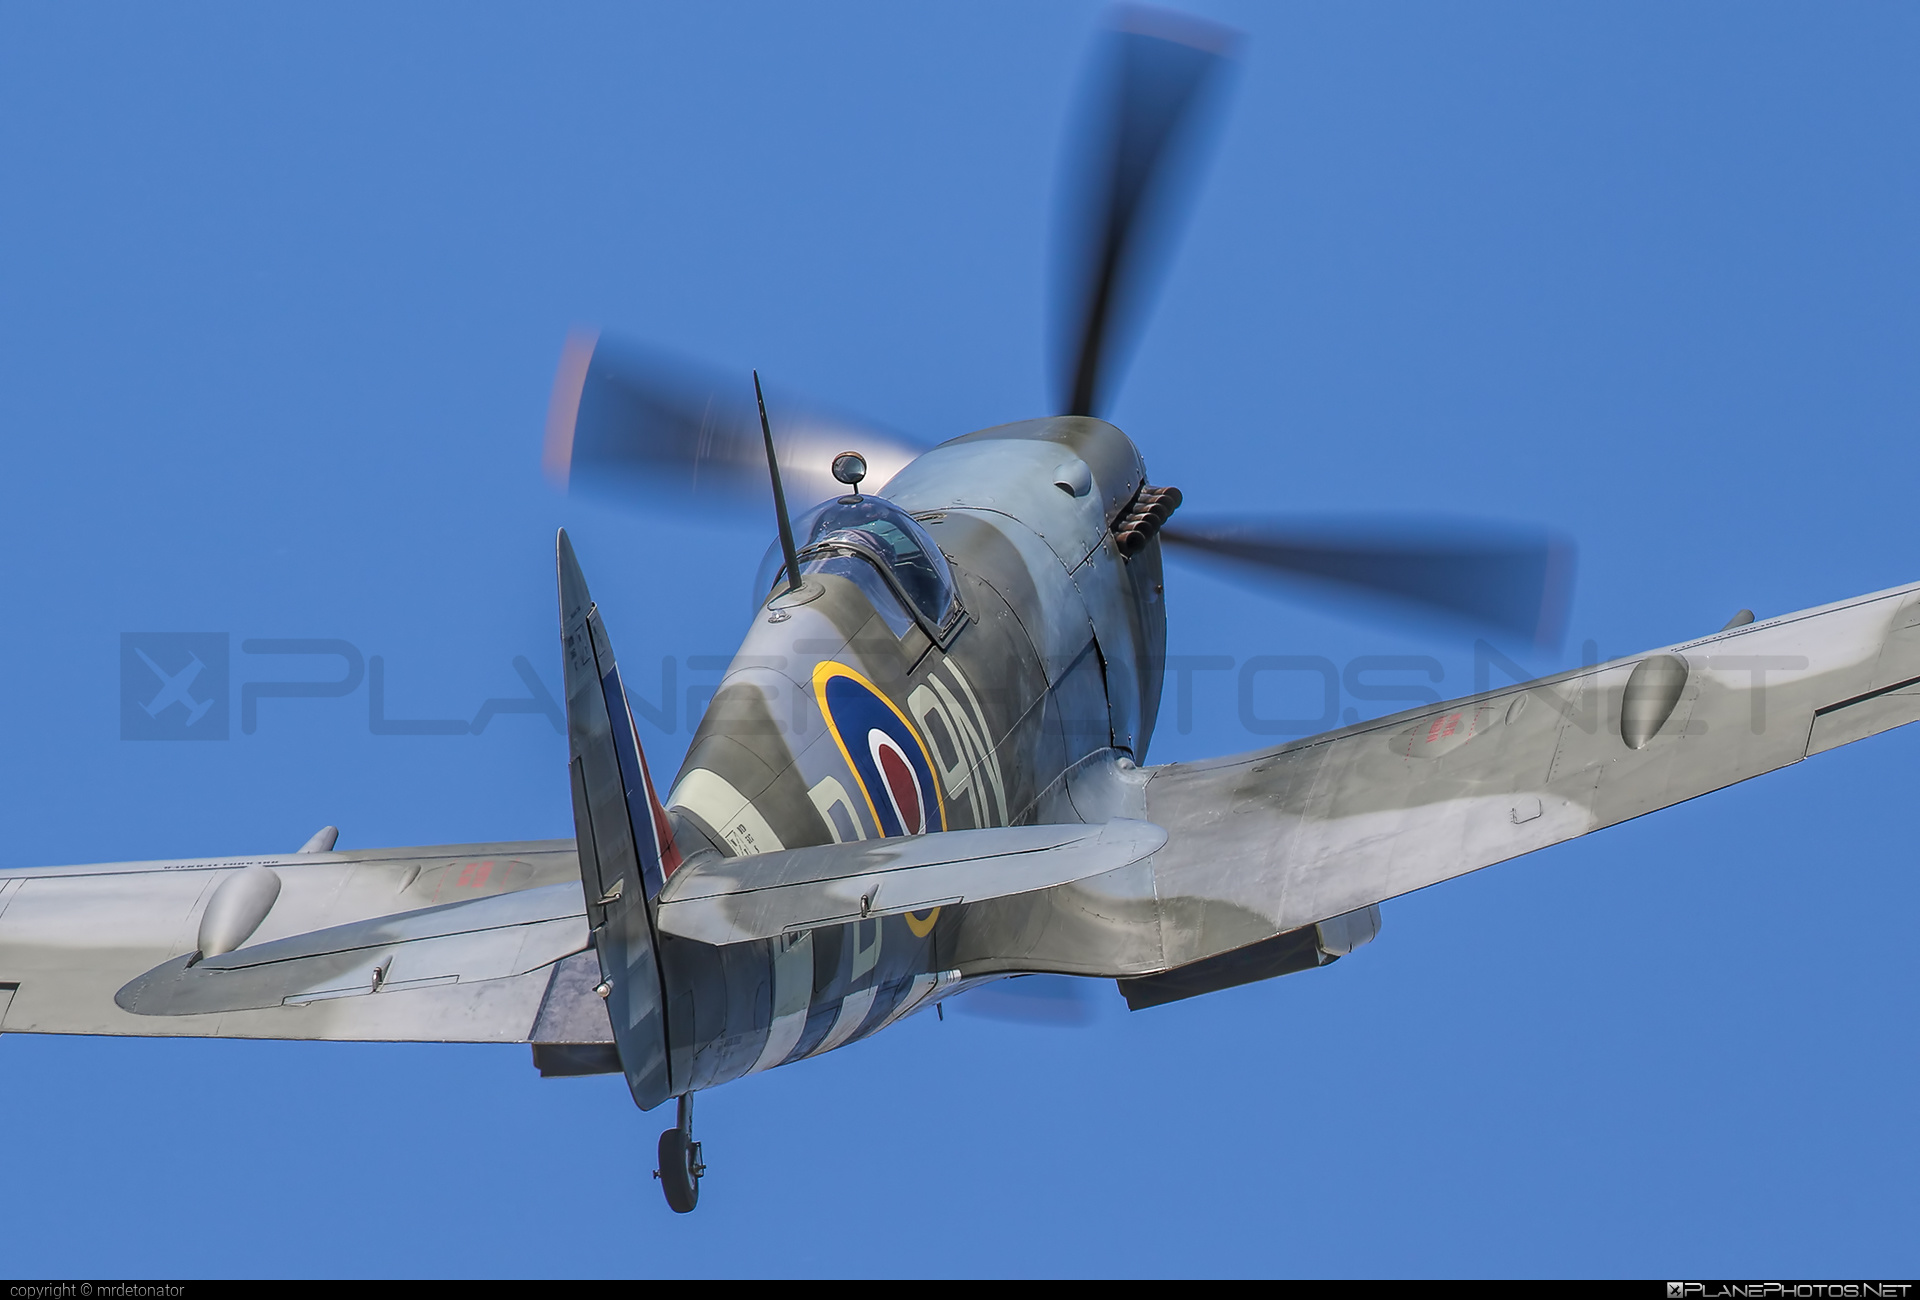 Supermarine Spitfire Mk.XVI - G-MXVI operated by Private operator #spitfire #spitfiremkxvi #supermarine